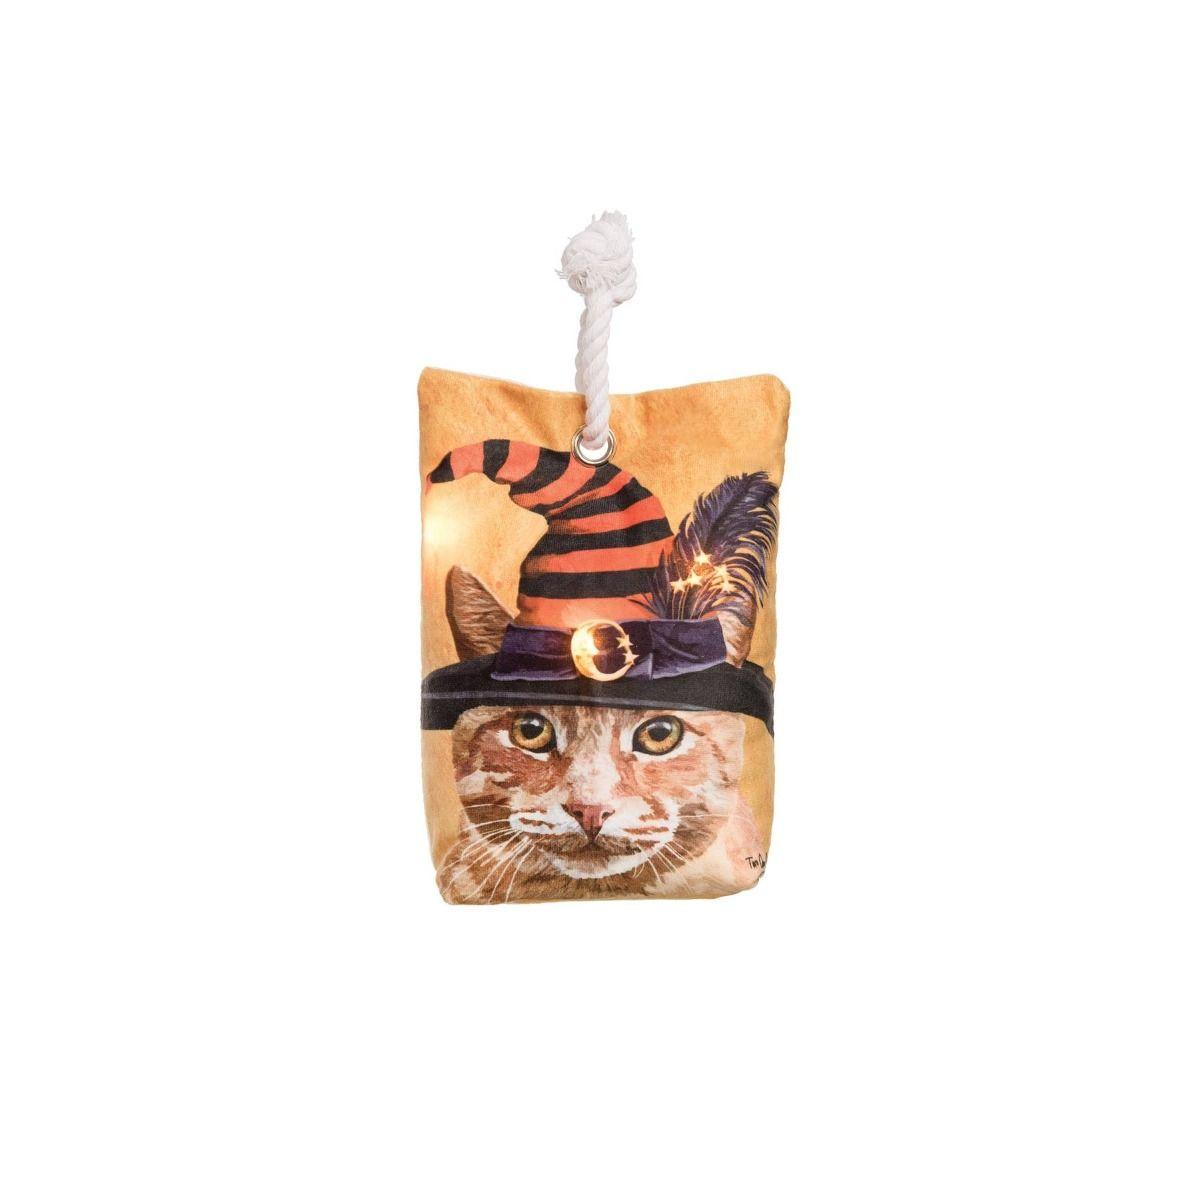 witch cat LED doorstop